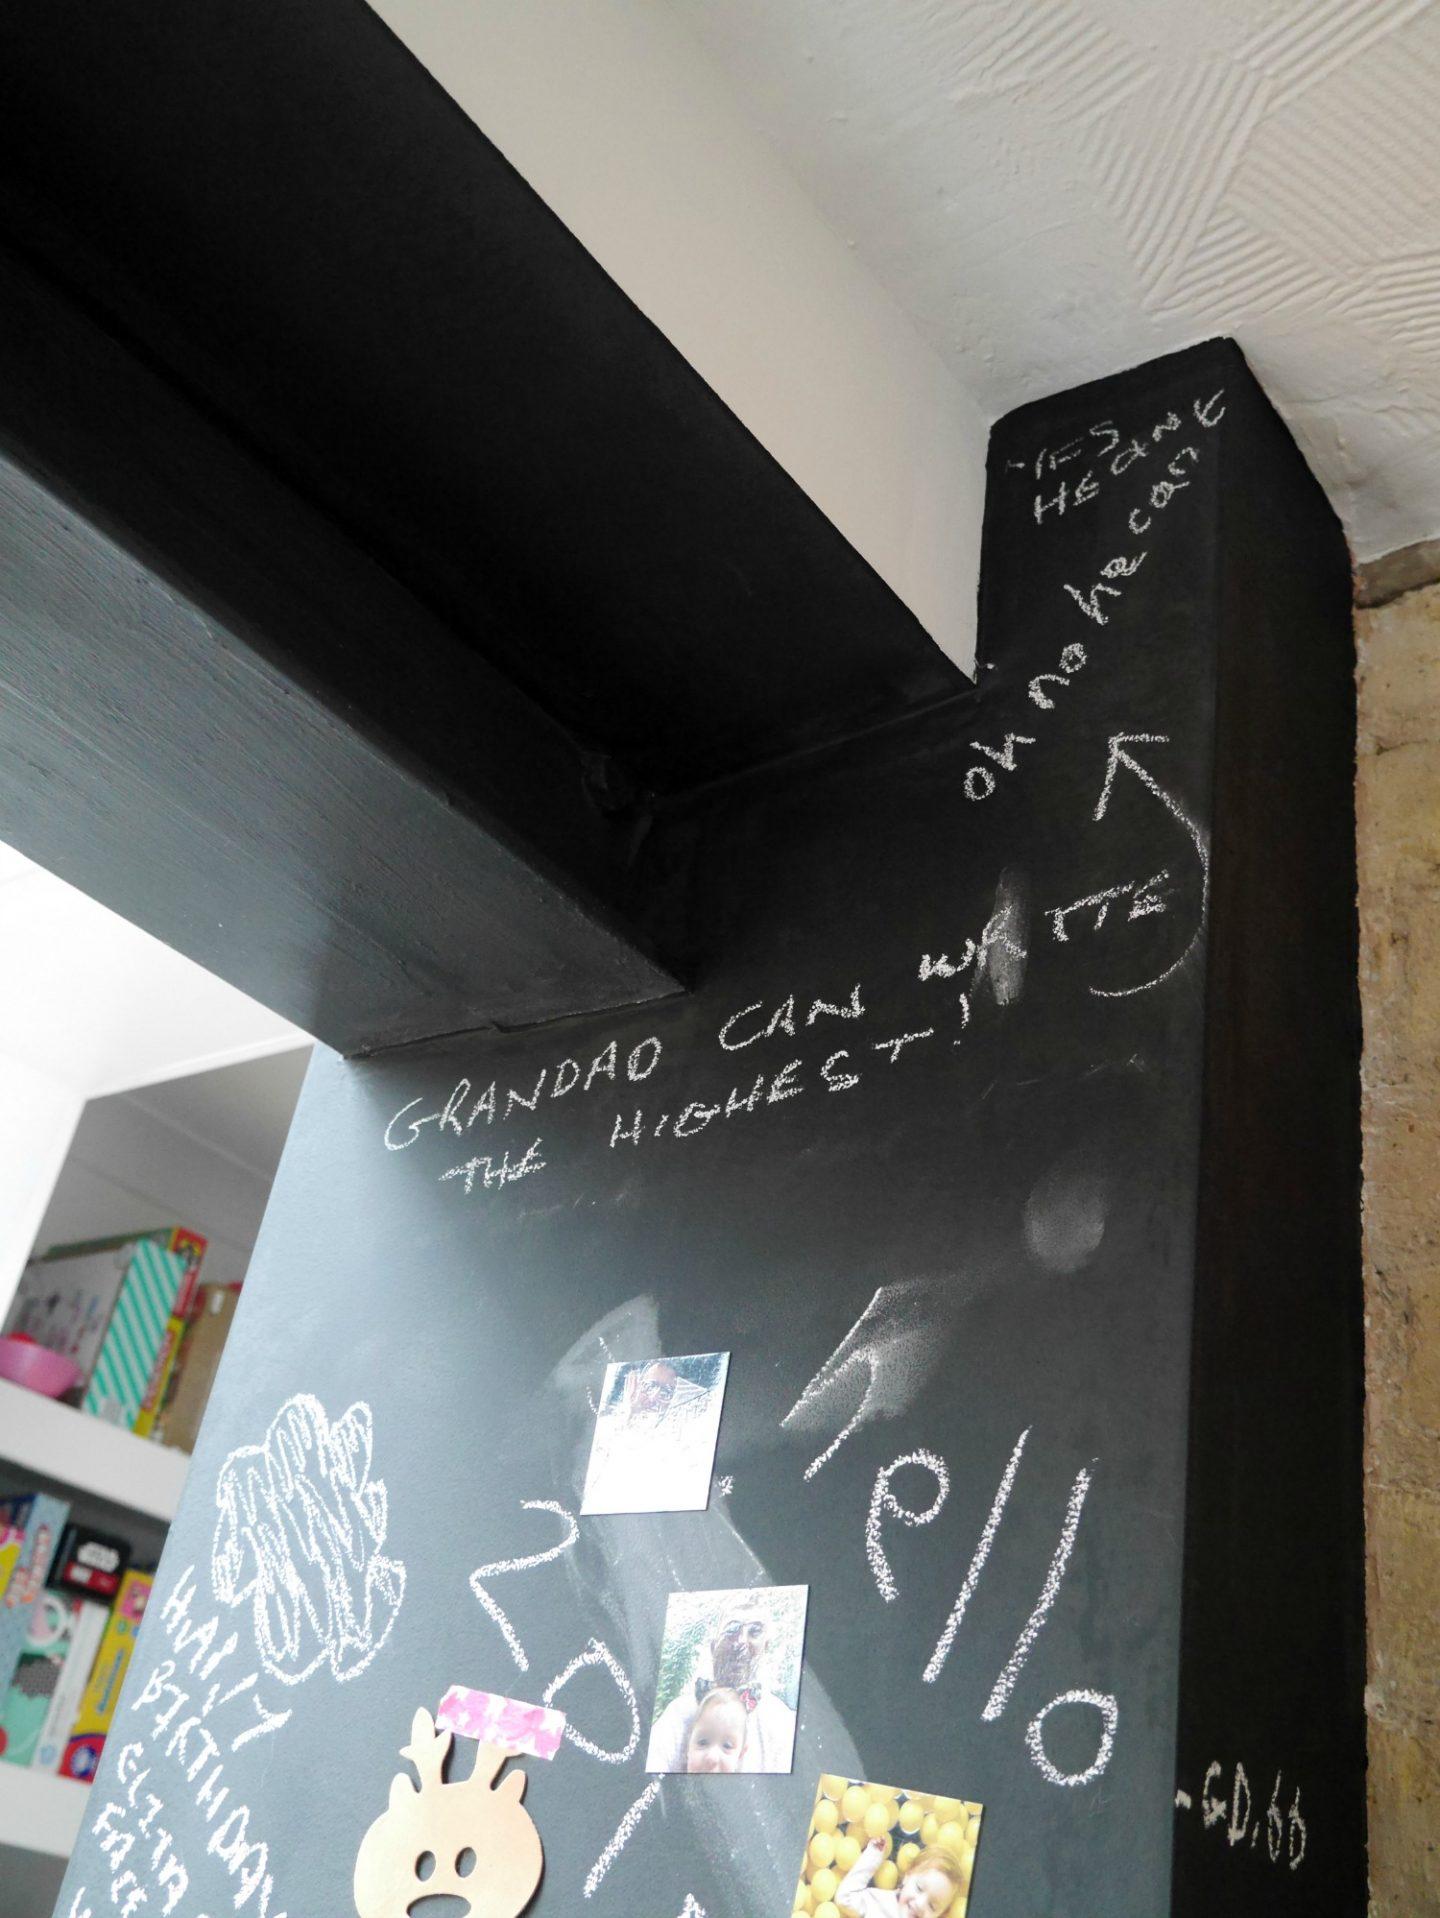 Chalkboard walls in kitchens - side return extension